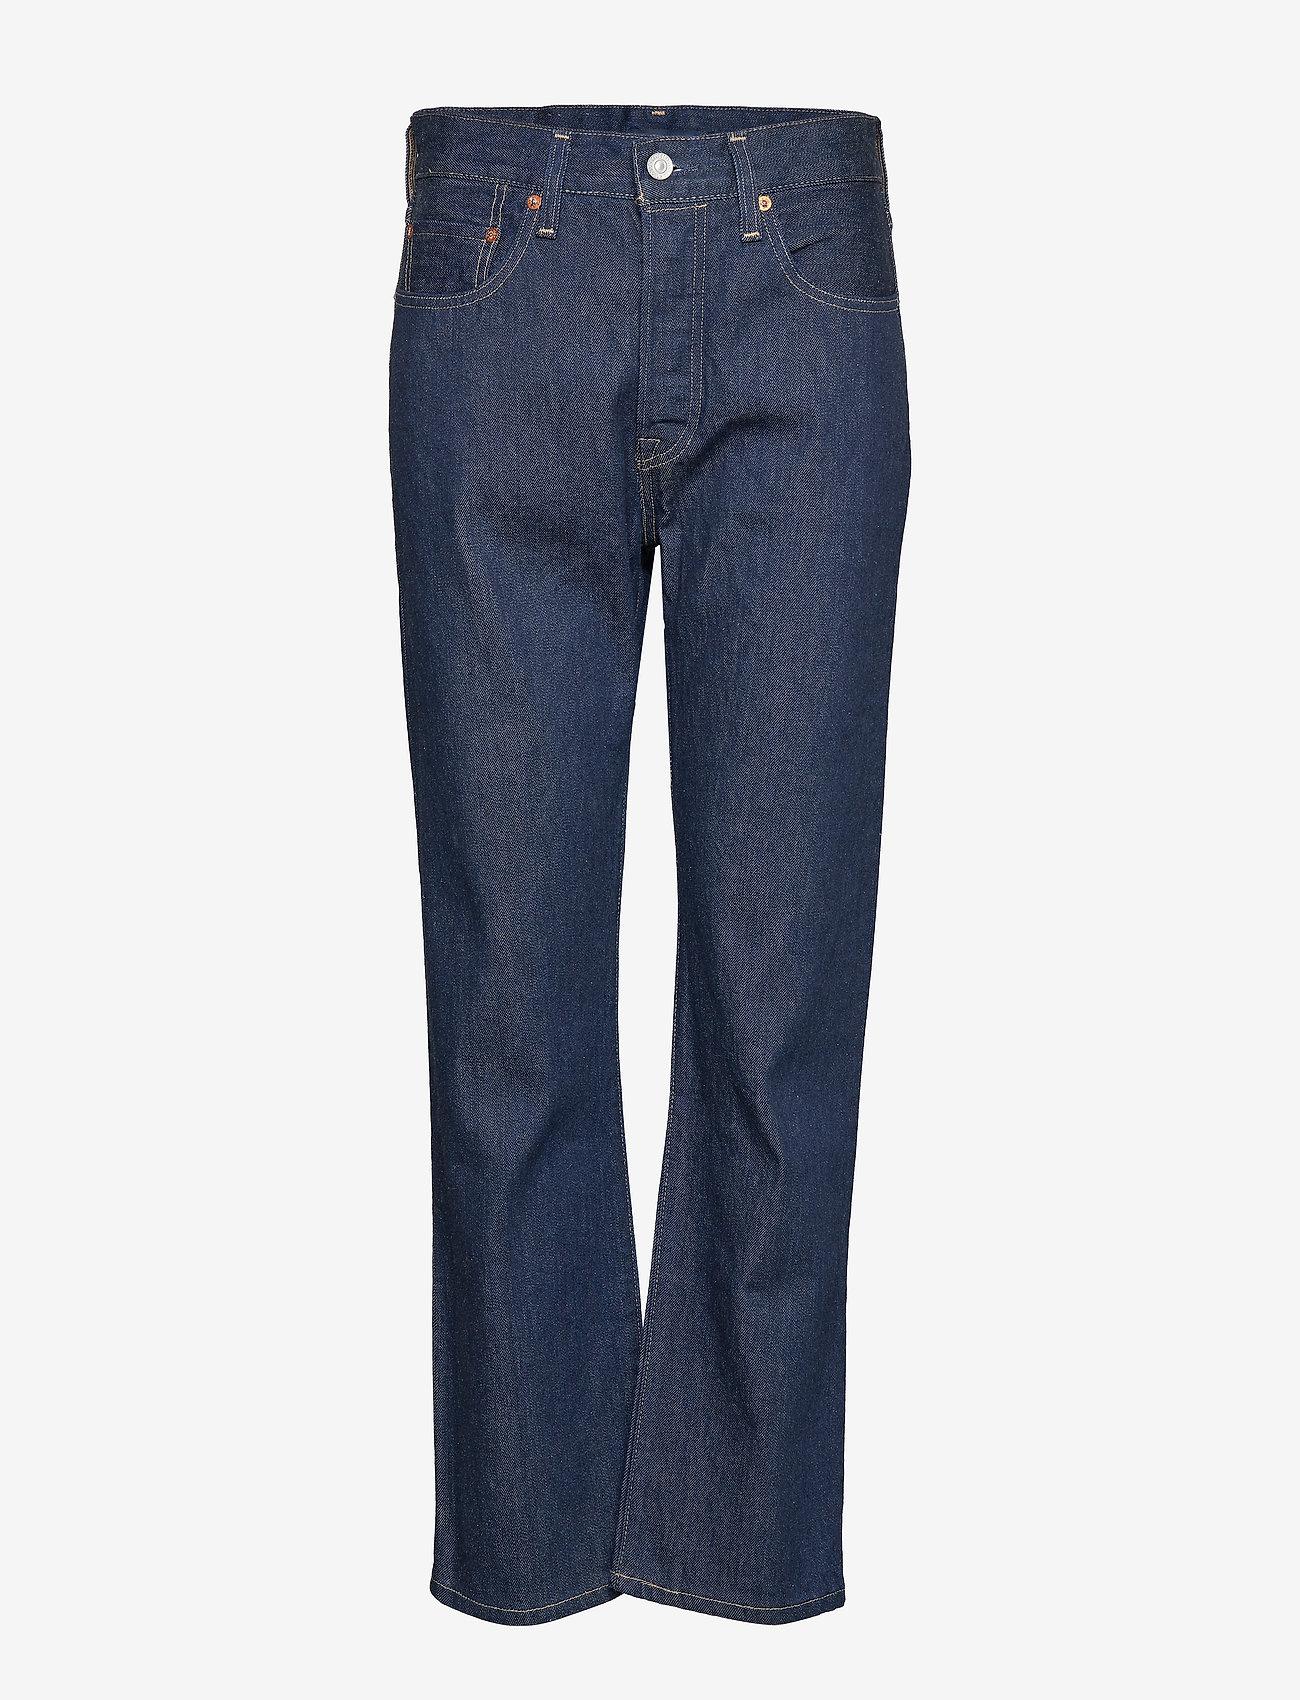 Levi's Made & Crafted - 501 CROP LMC RAW INDIGO - straight jeans - dark indigo - flat finish - 0